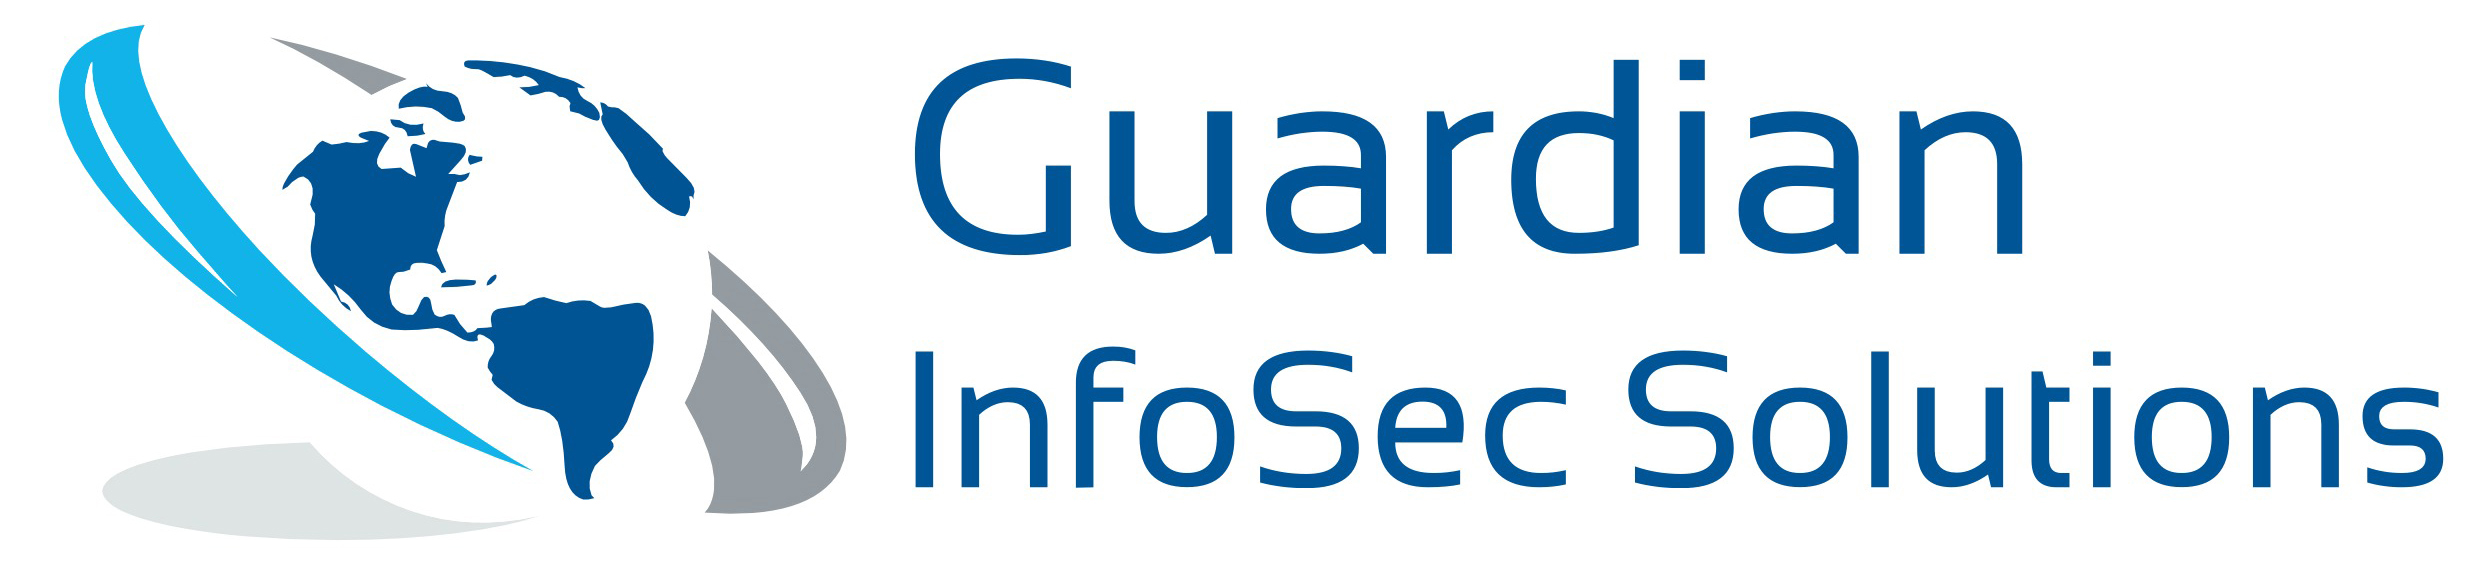 Guardian InfoSec Solutions